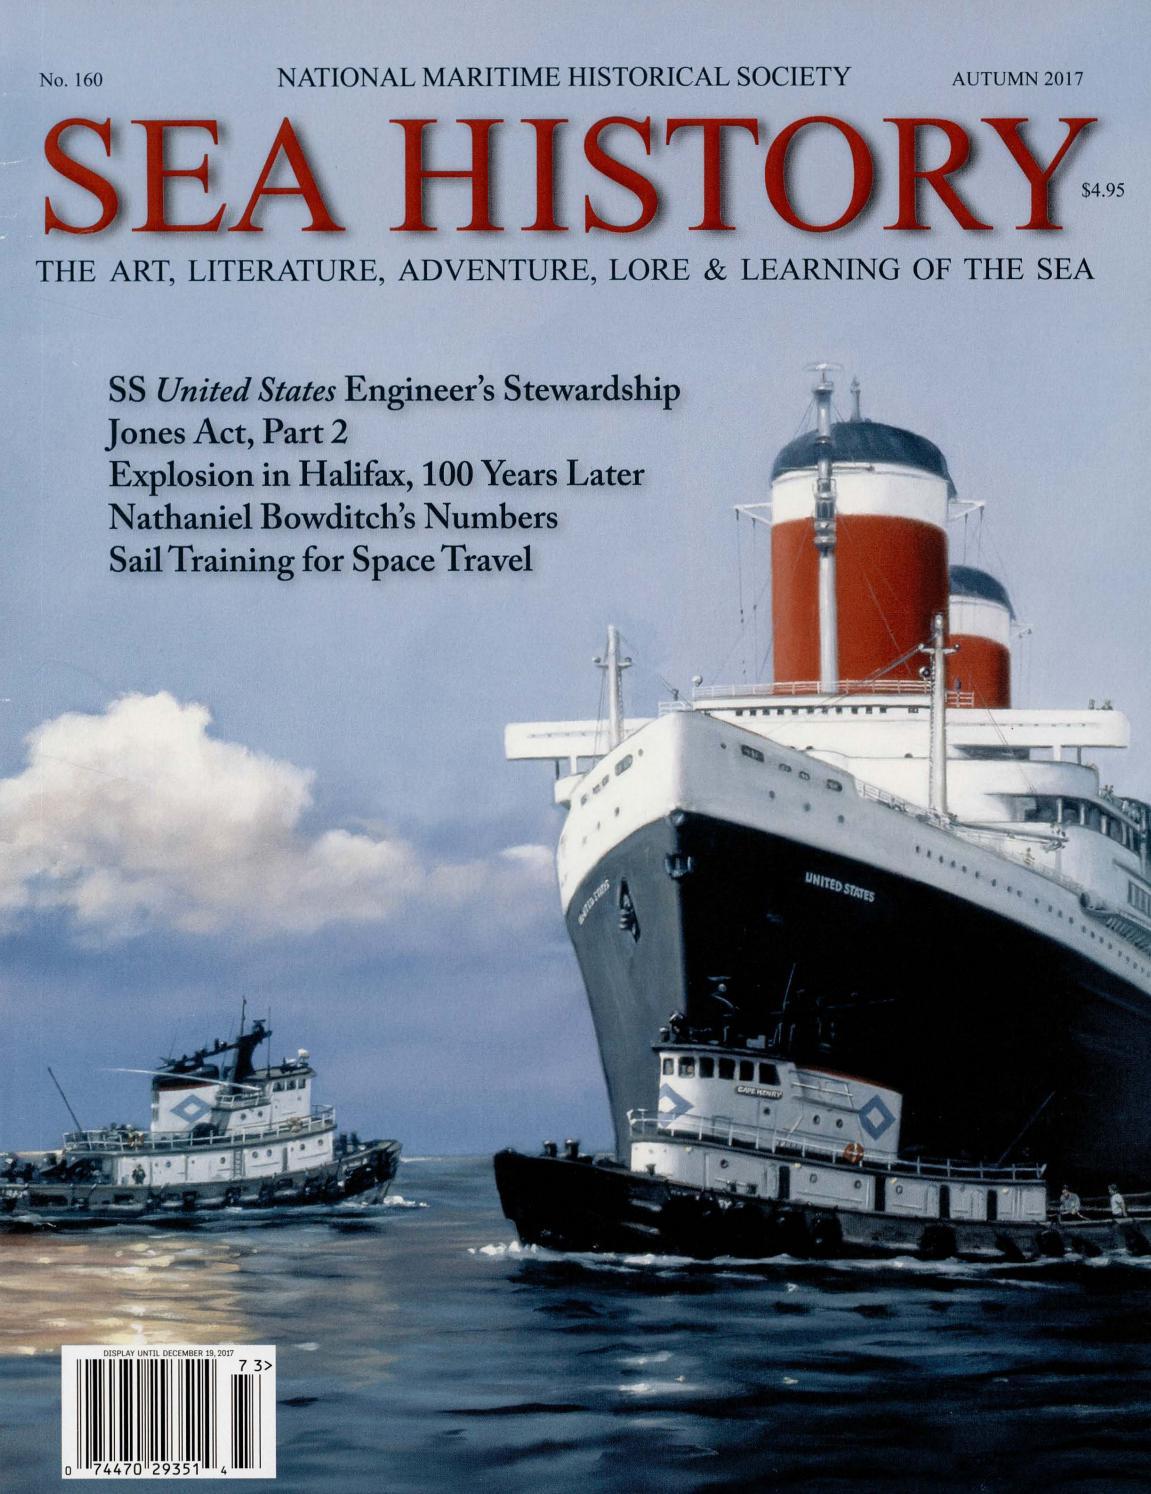 Sea History 160 - Autumn 2017 by National Maritime Historical Society & Sea  History Magazine - issuu